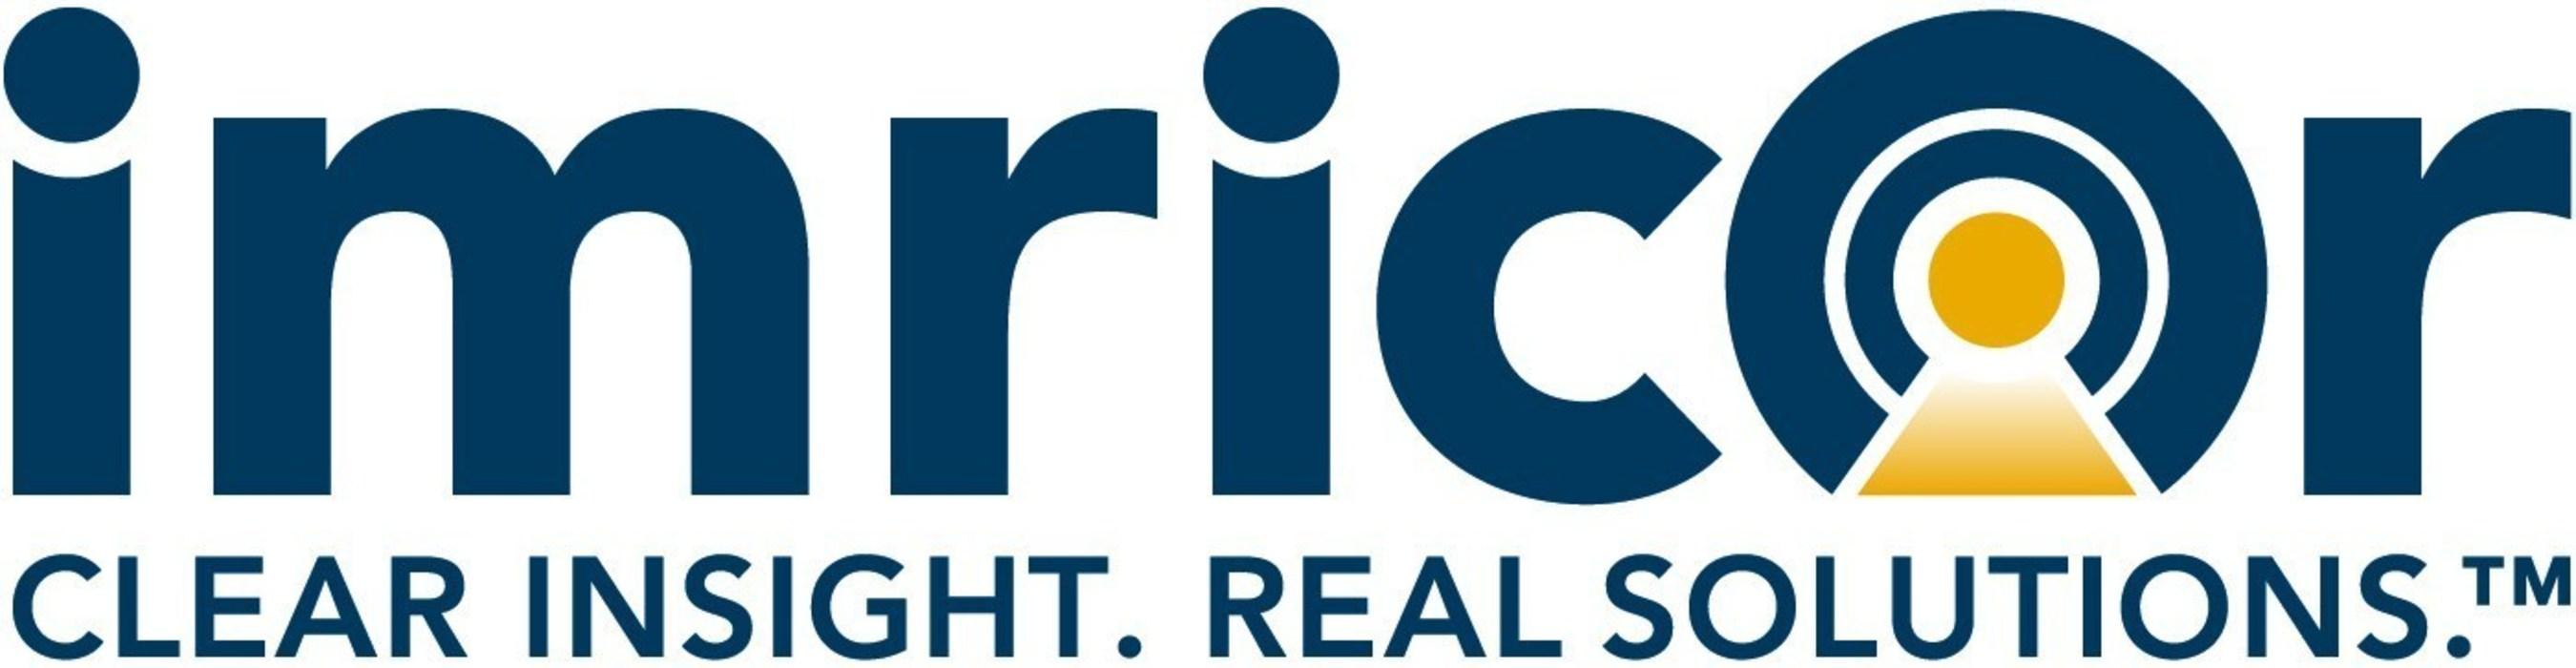 Imricor Medical Systems ontvangt CE-markering voor met MR compatibele Advantage-MR EP recorder- en